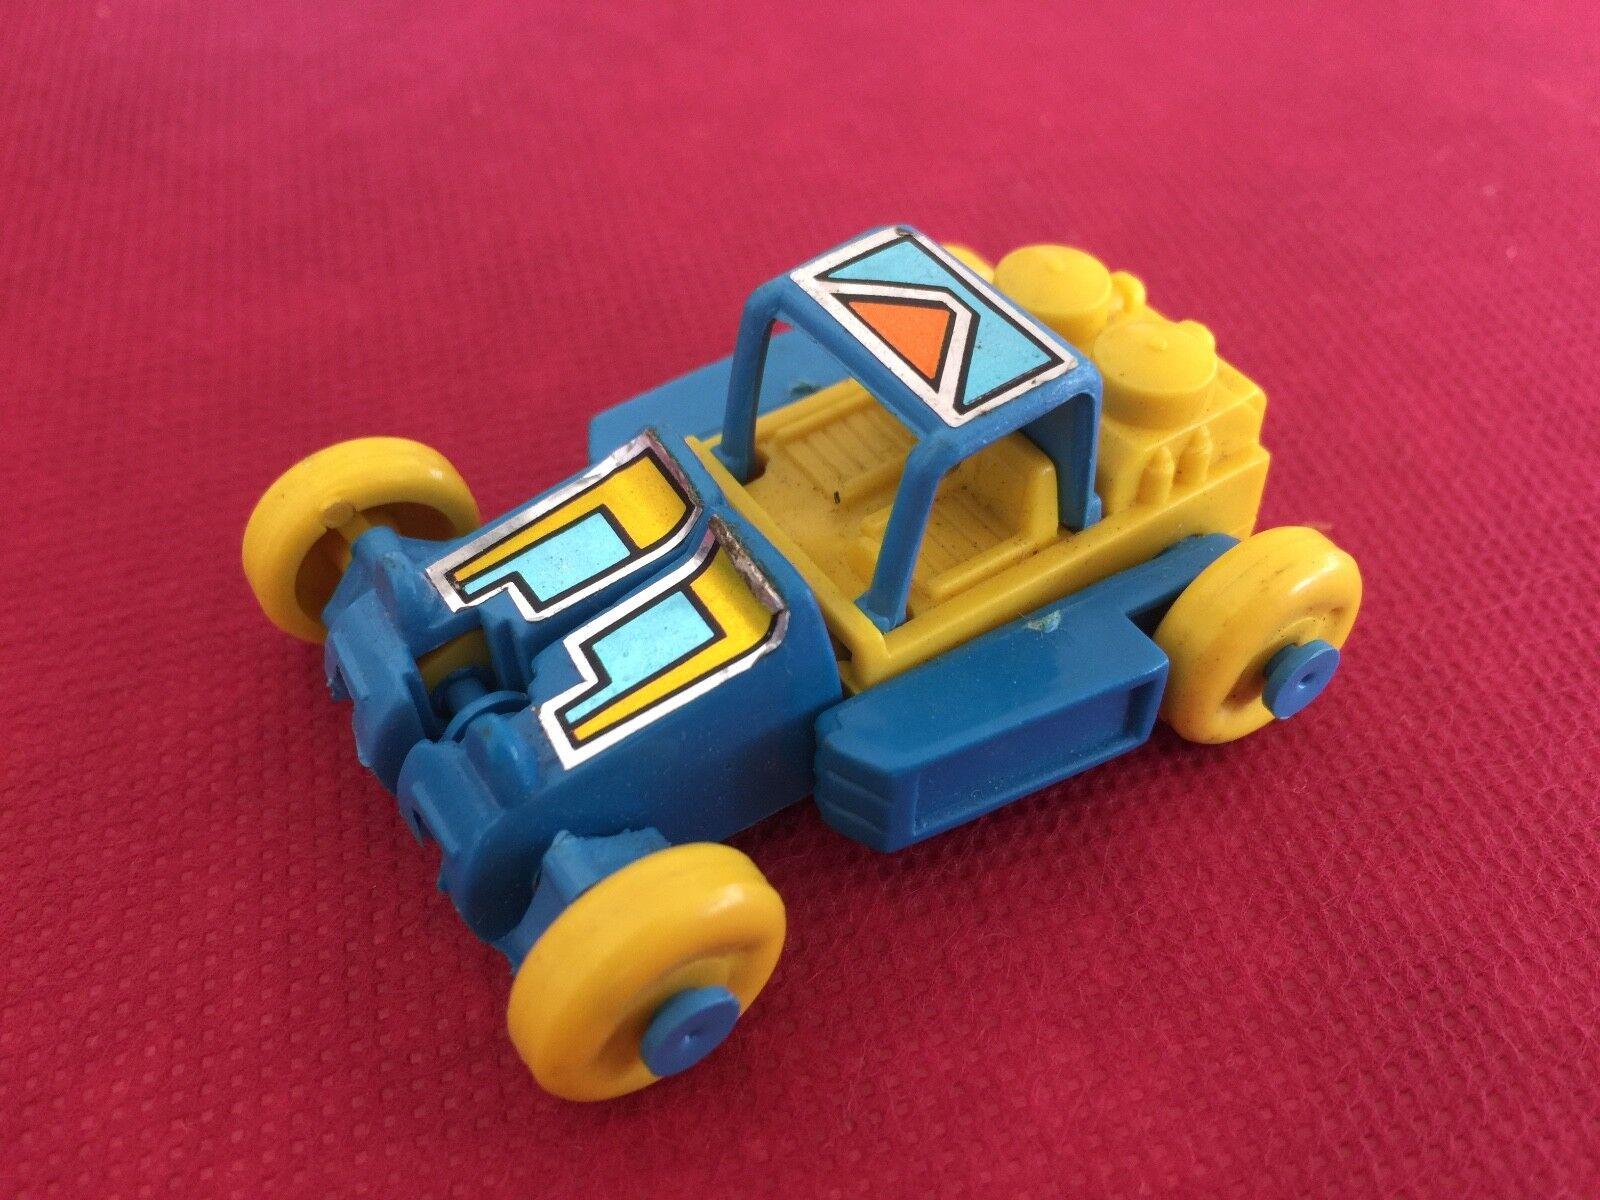 Transformers GISMA yellow BEACHCOMBER figure spannish european